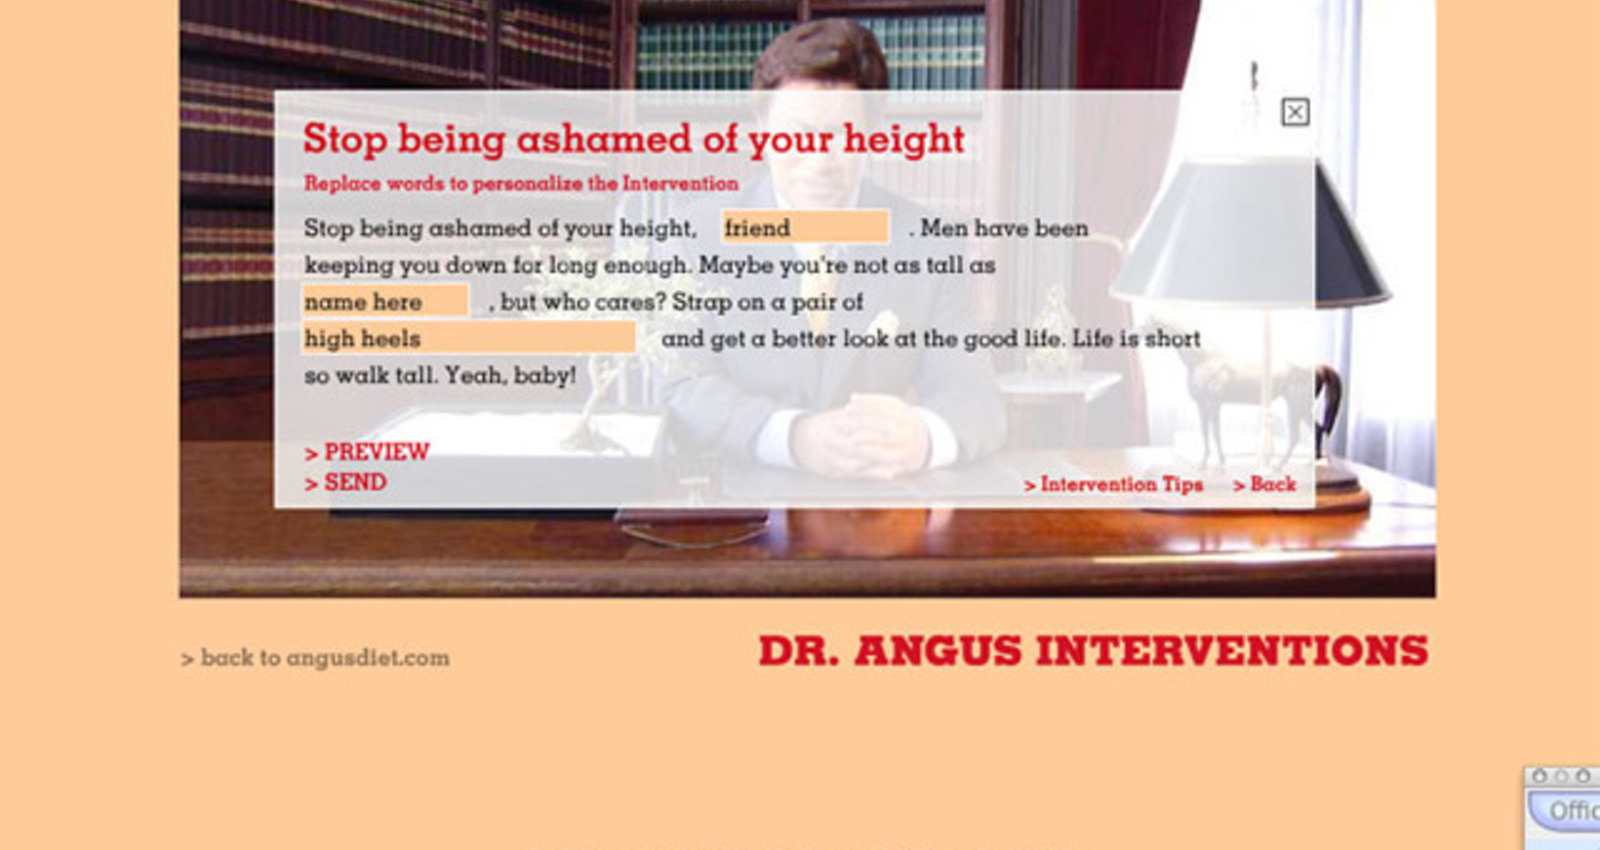 Angus Interventions